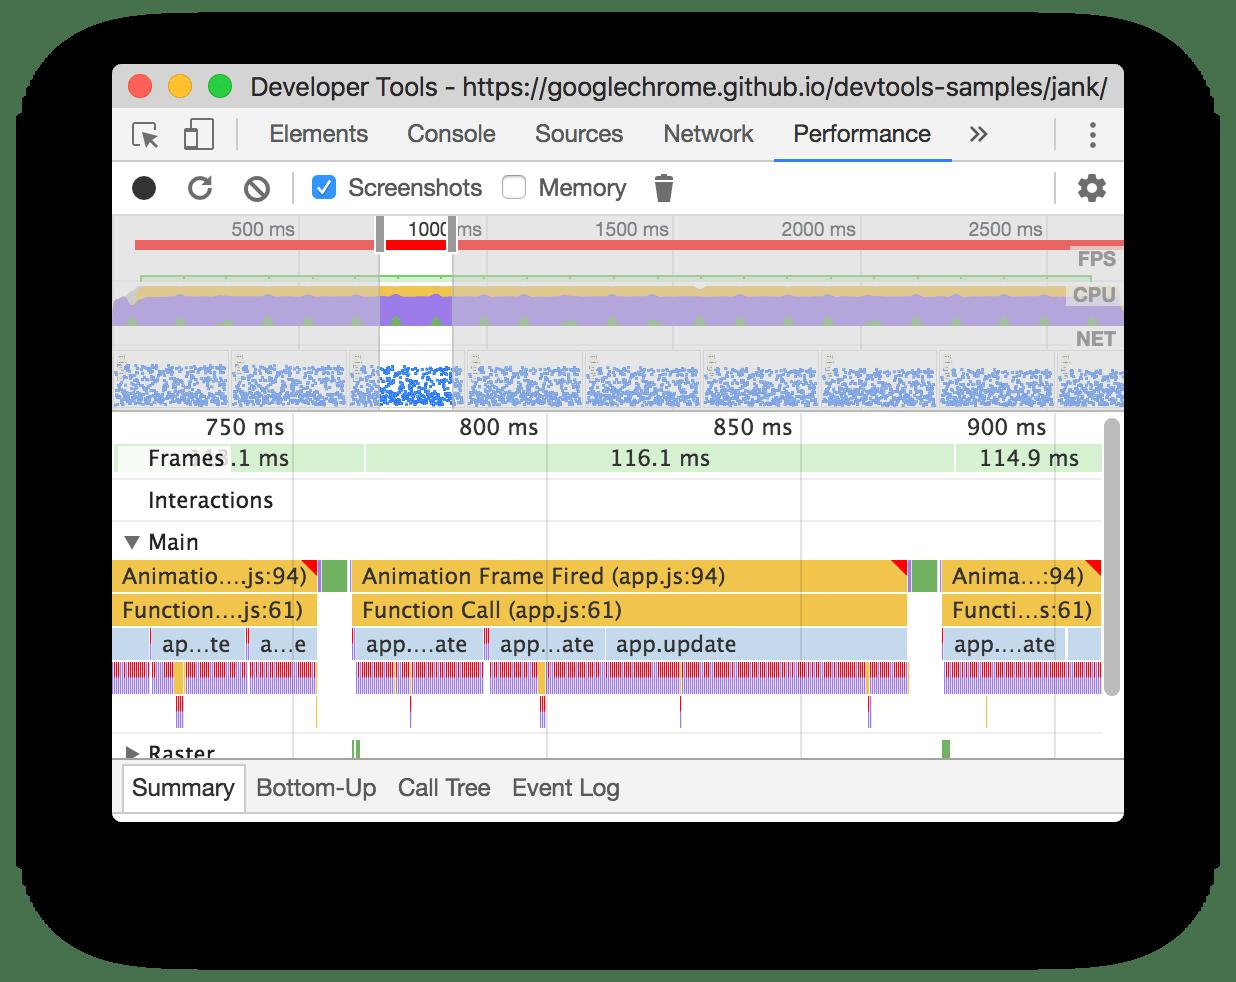 Javascript execution performance details